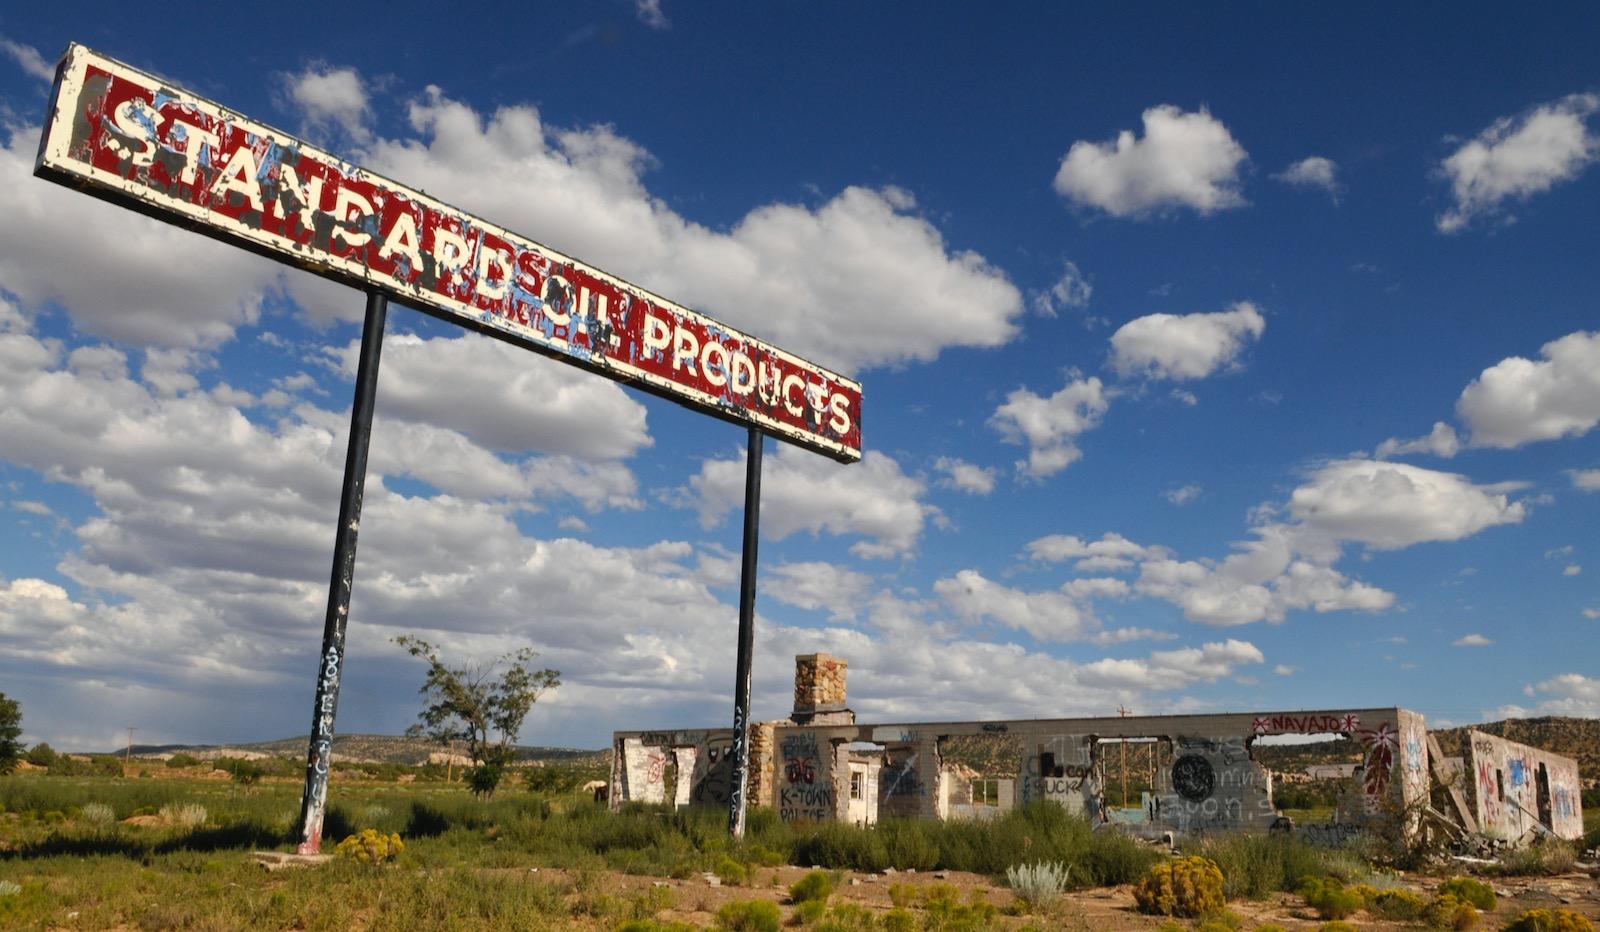 An abandoned Standard Oil gas station, Tonalea, Arizona, 2008